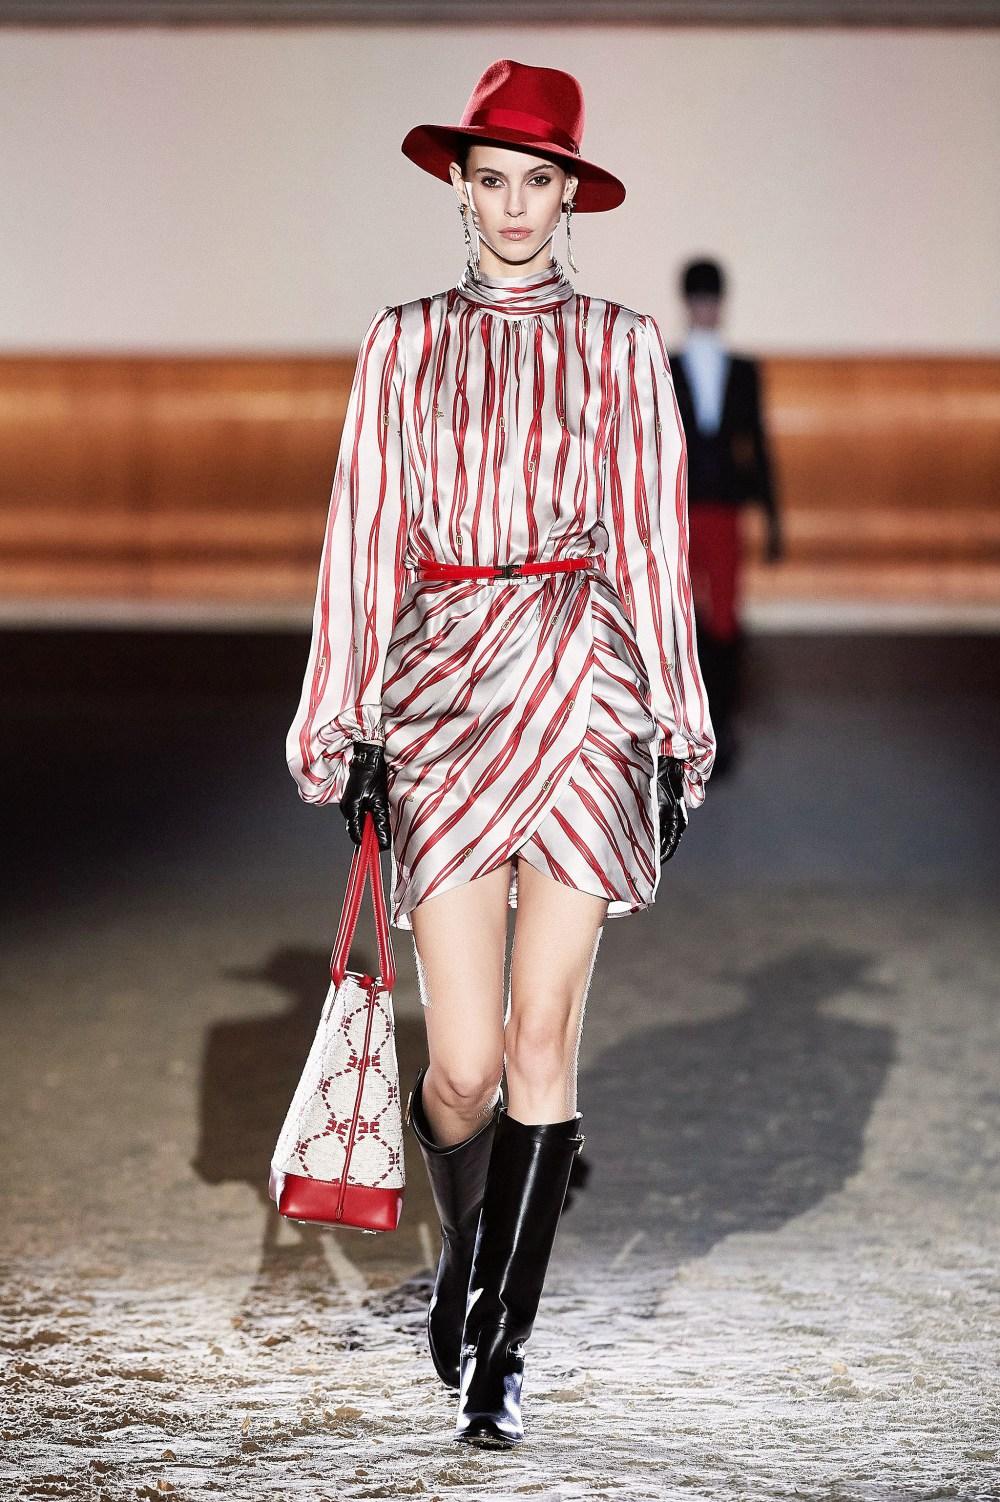 Elisabetta Franchi: Elisabetta Franchi Fall Winter 2021-22 Fashion Show Photo #37